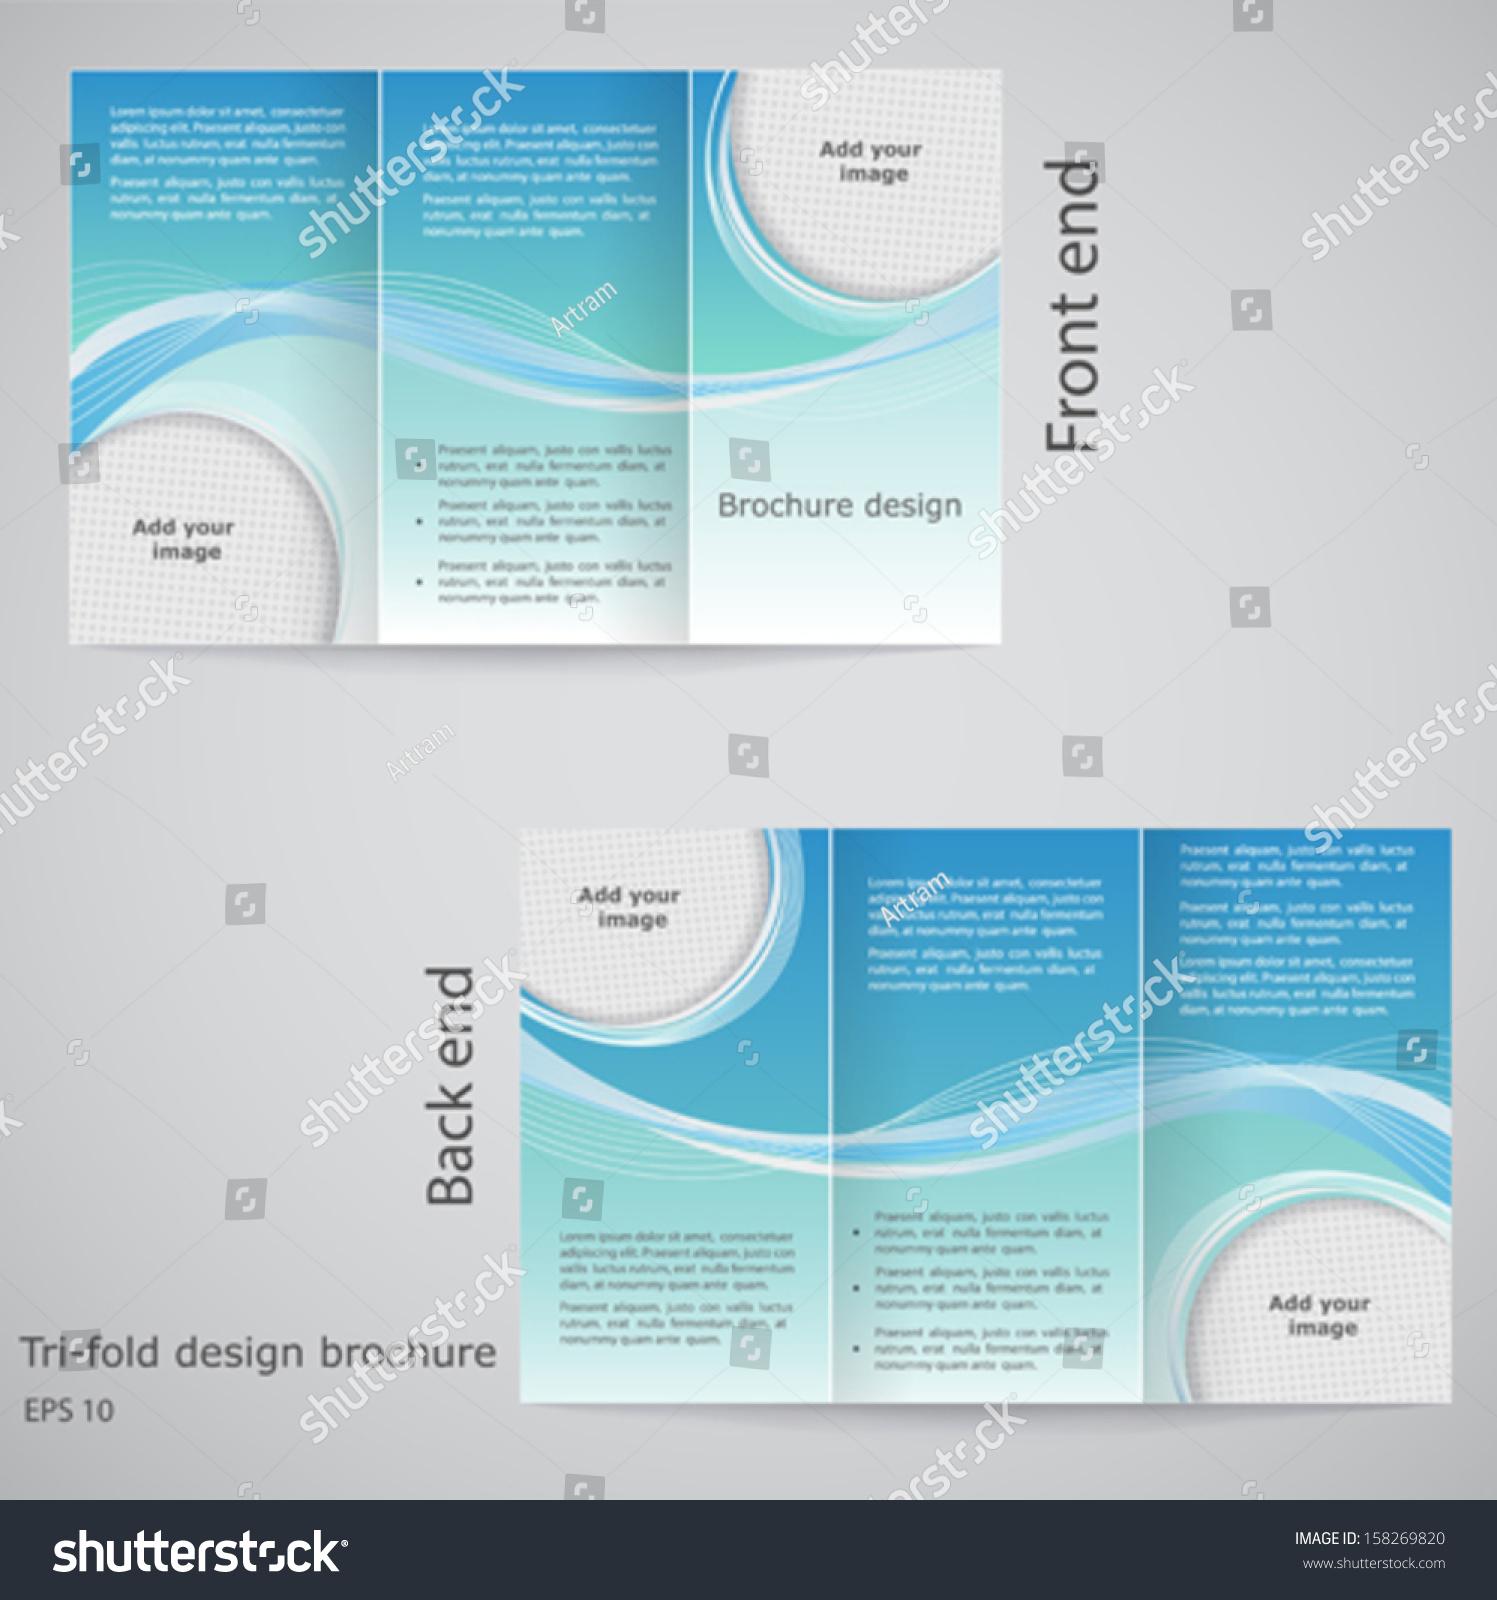 Trifold Brochure Design Brochure Template Design Stock Vector ...